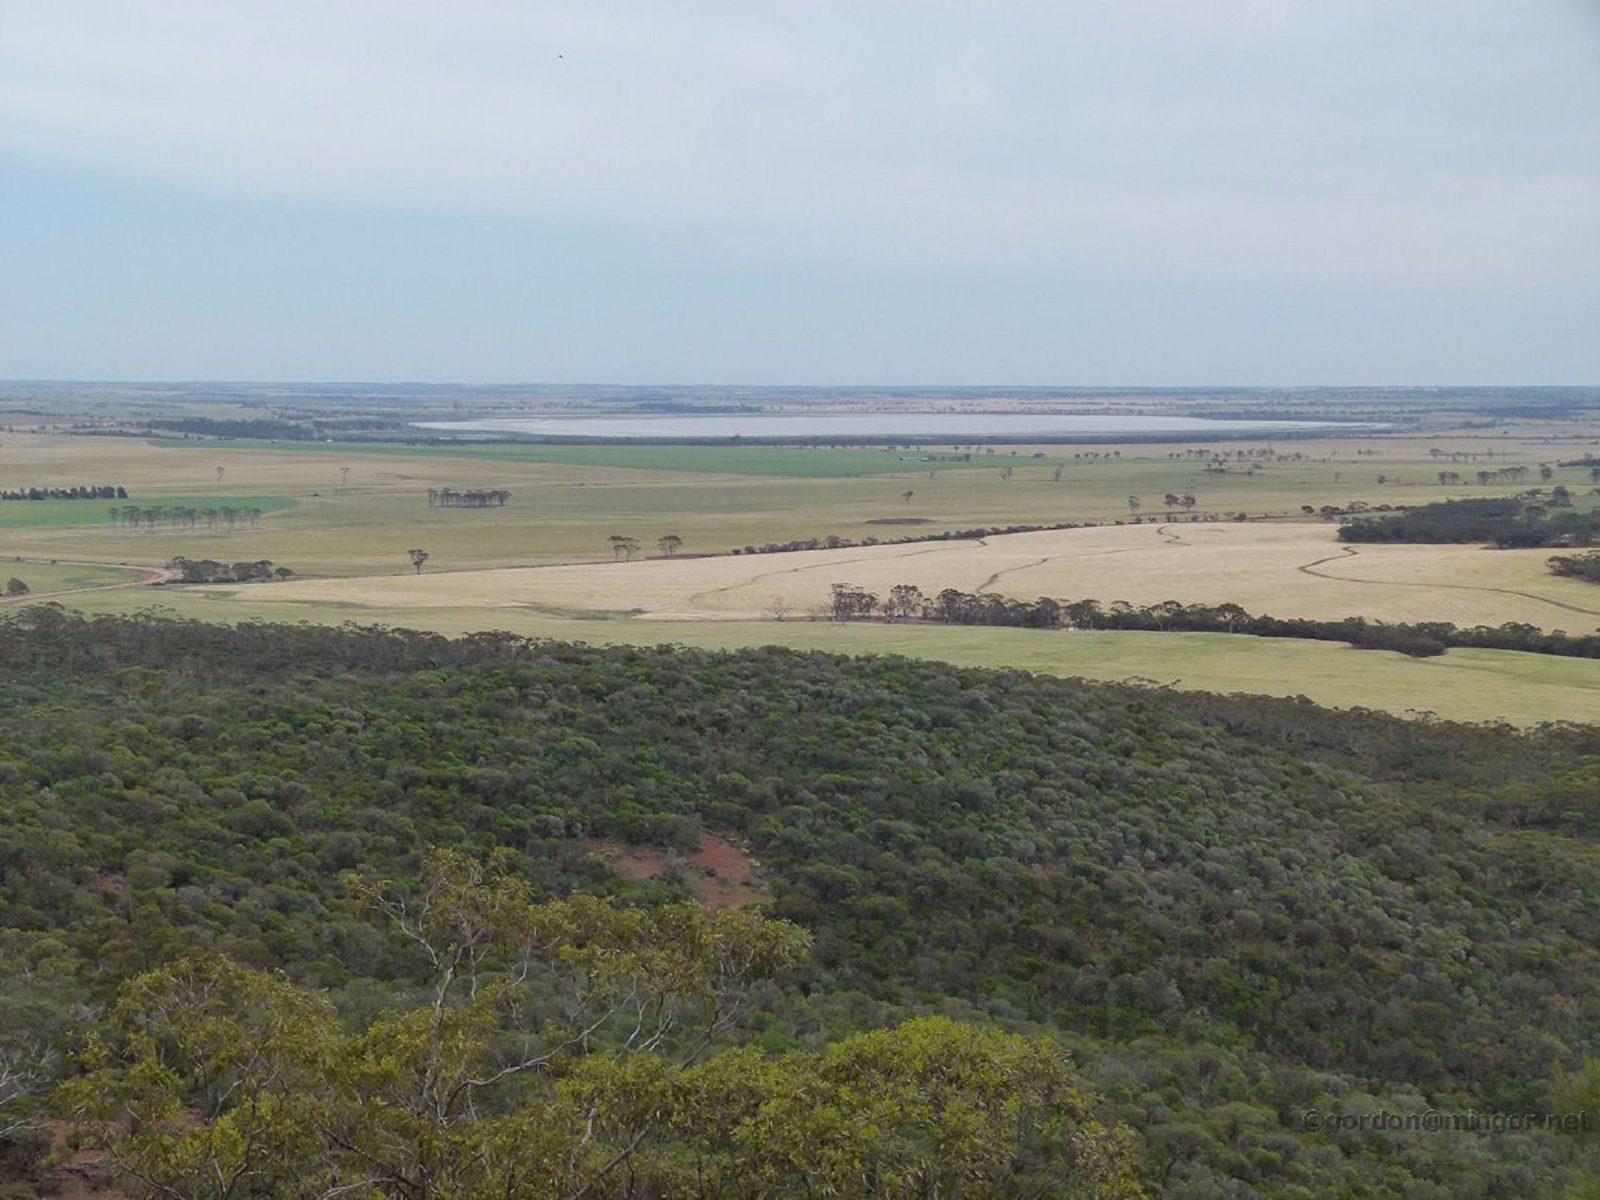 Mount O'Brien, Wongan Hills, Western Australia